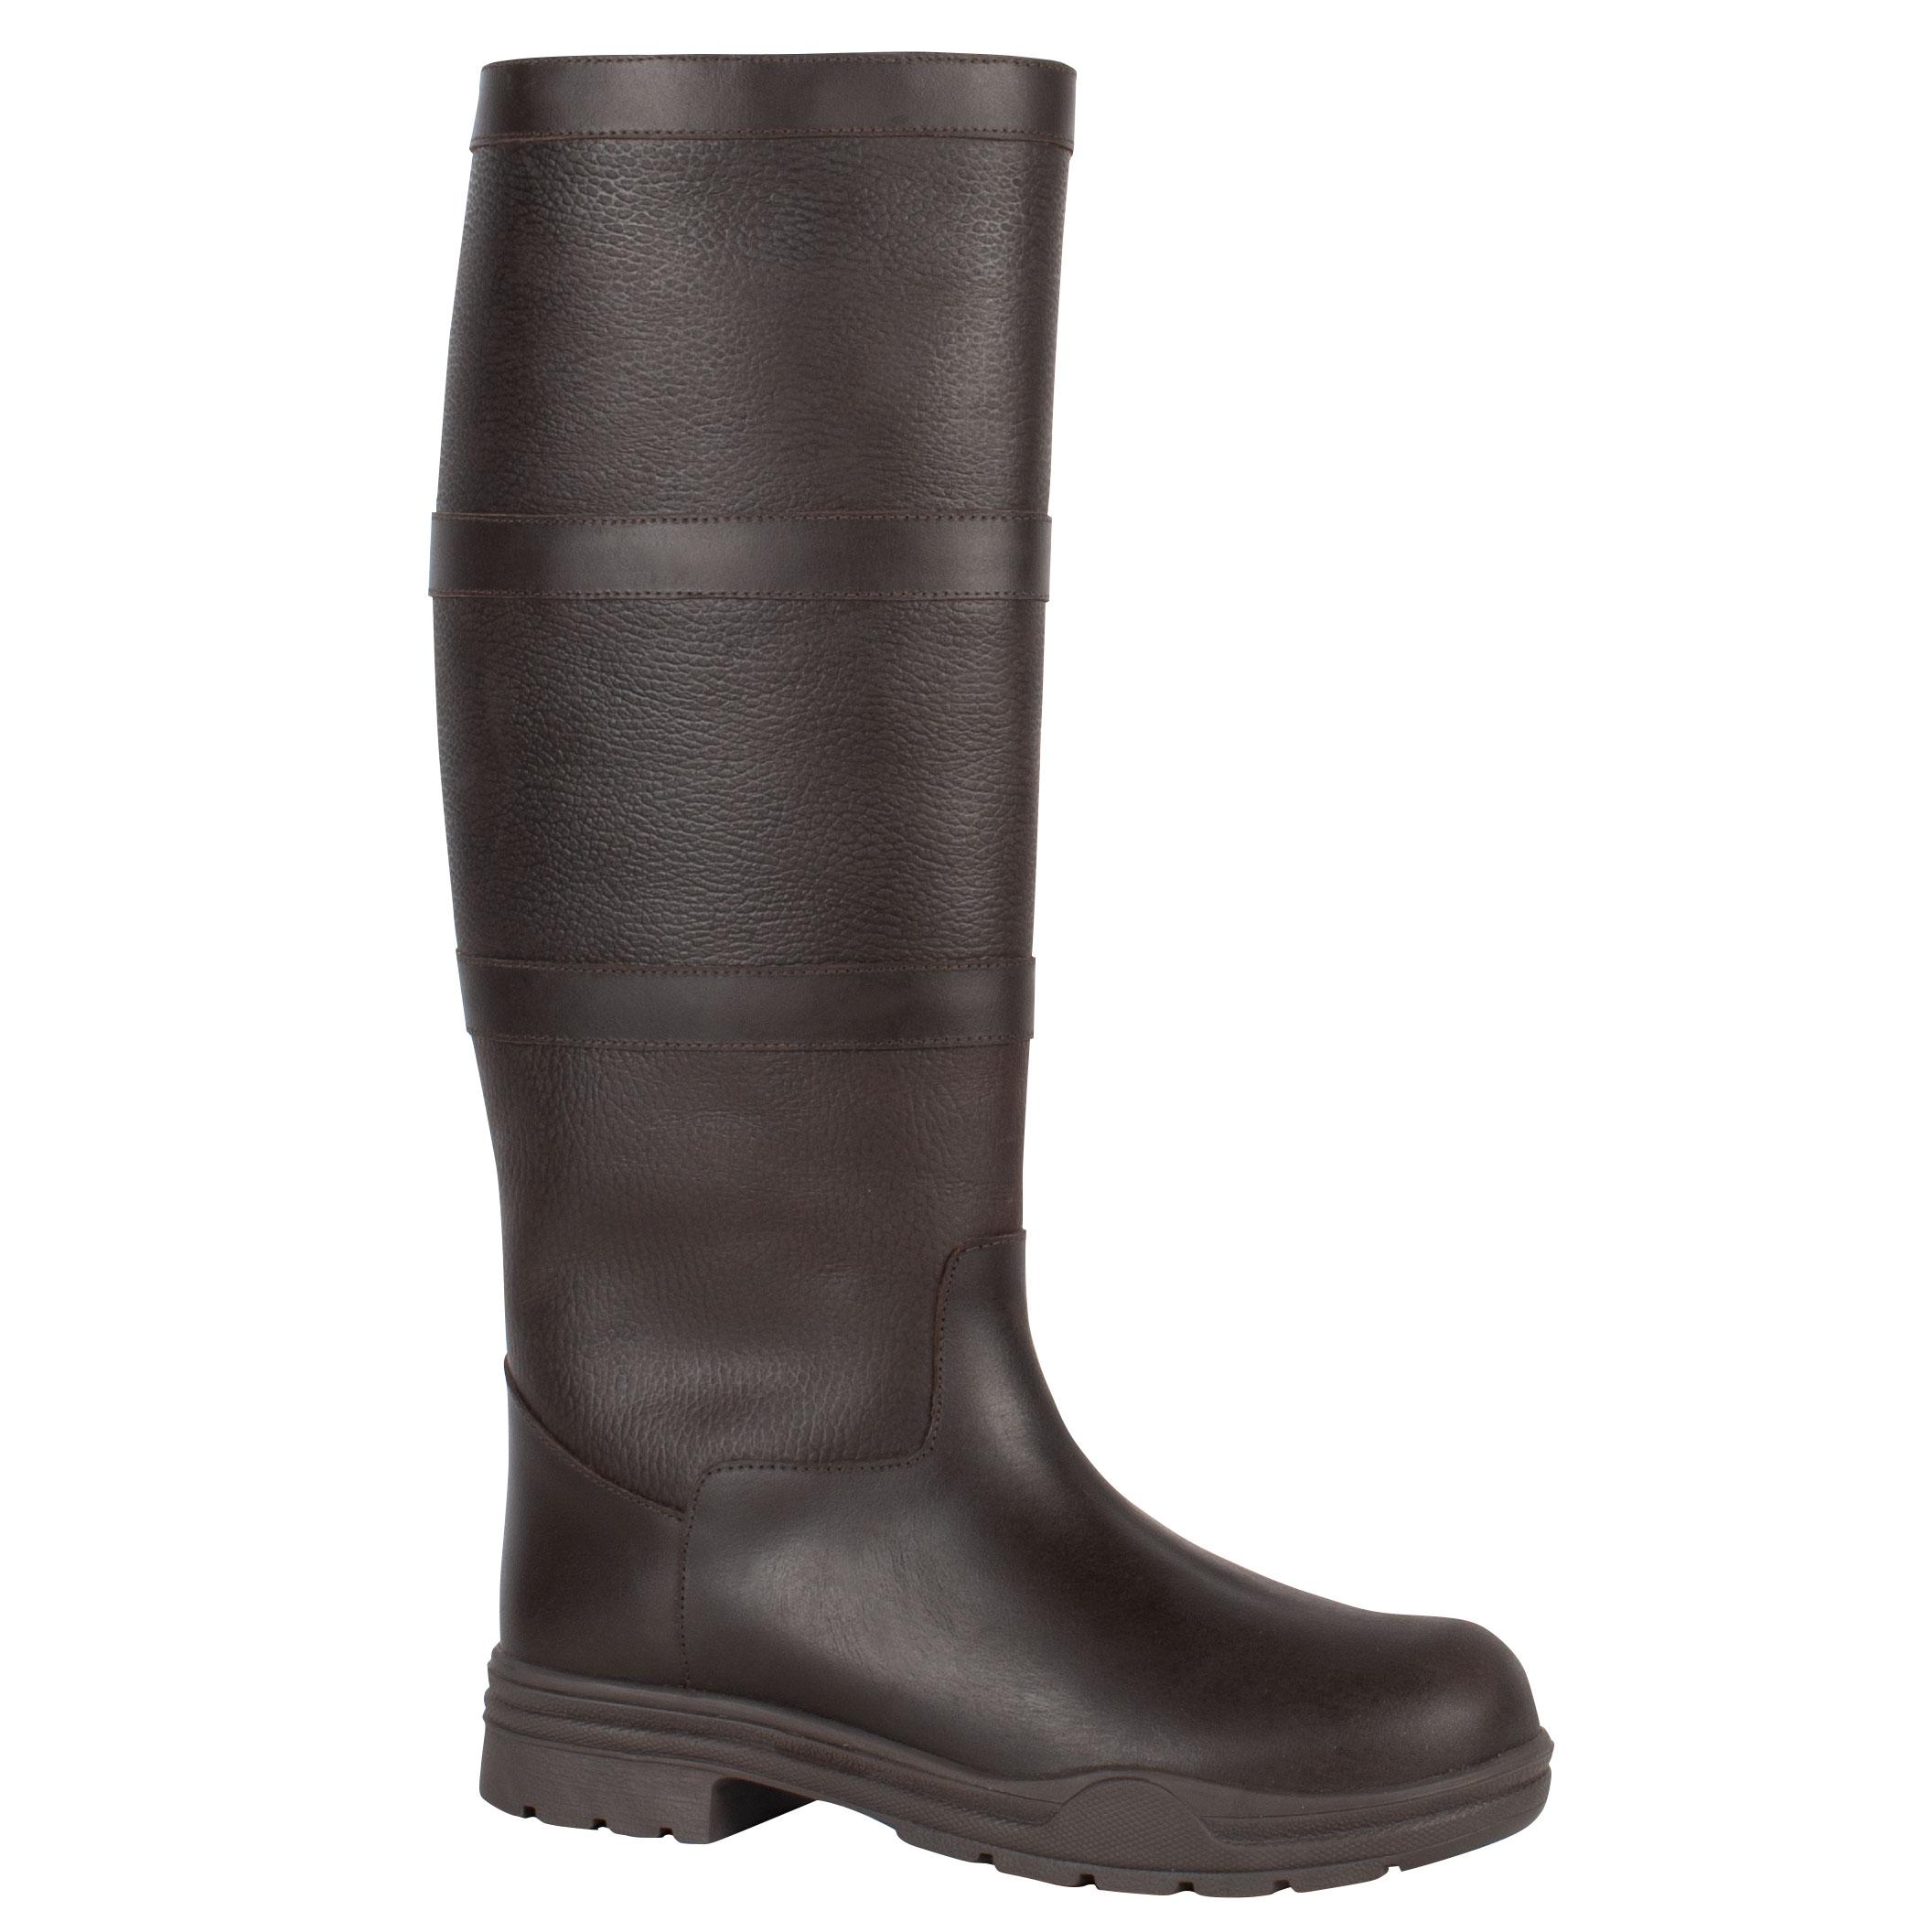 Mondoni Country Boots